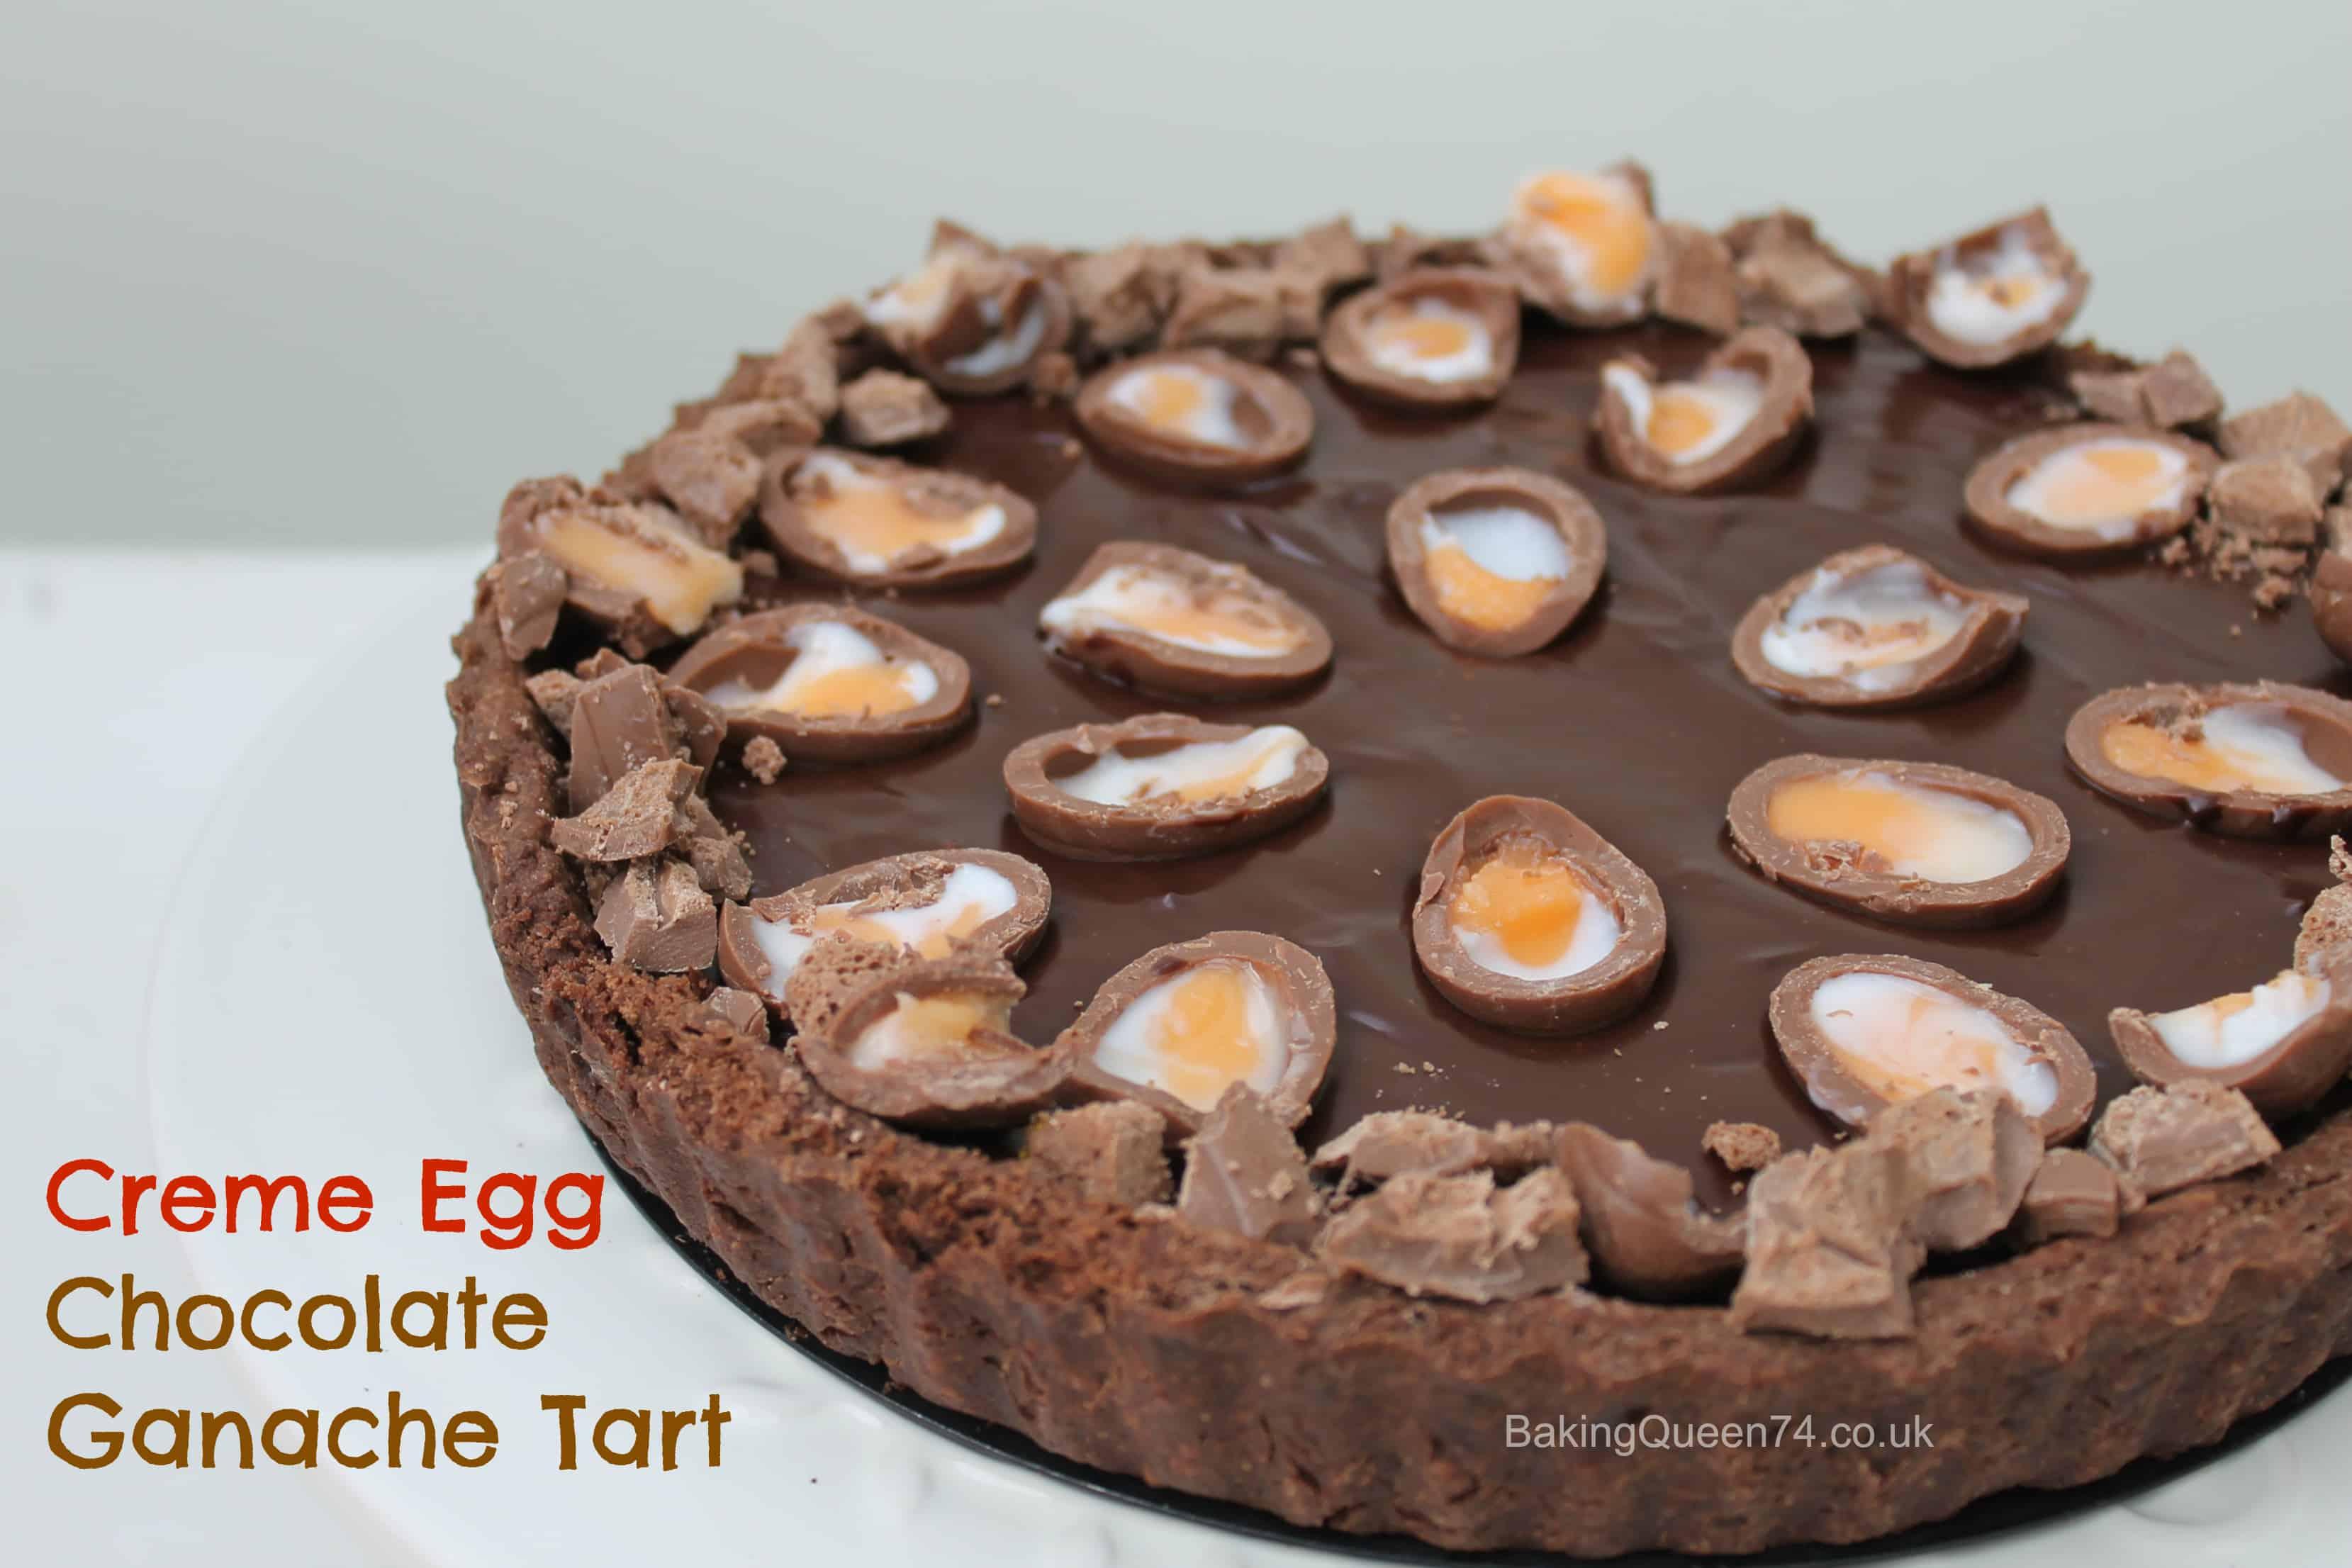 Creme Egg chocolate ganache tart - BakingQueen74